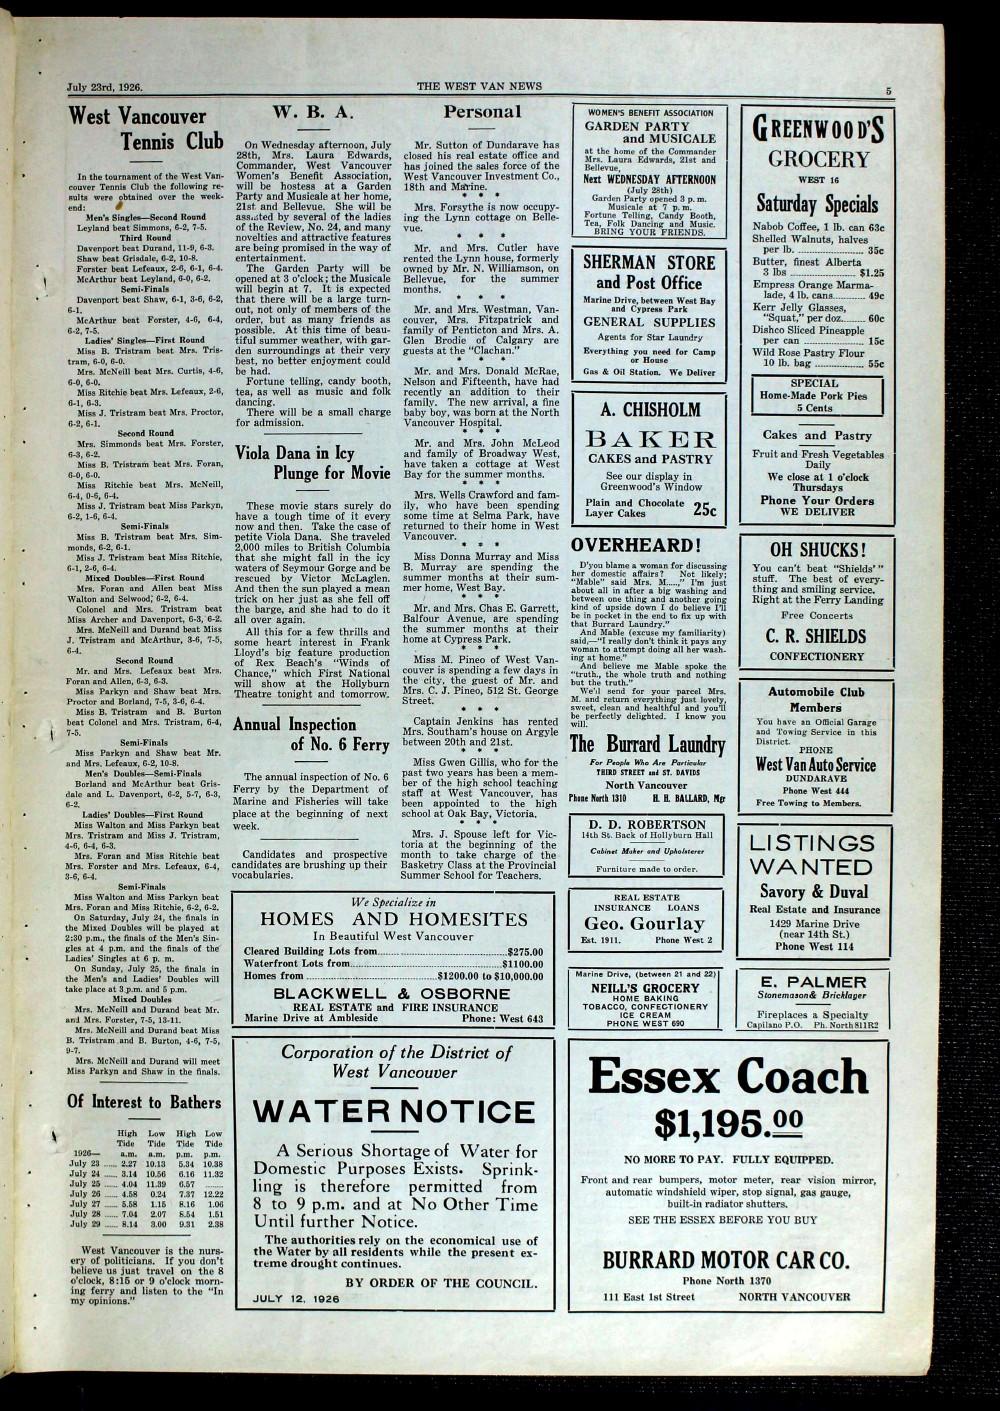 West Van. News (West Vancouver), 23 Jul 1926